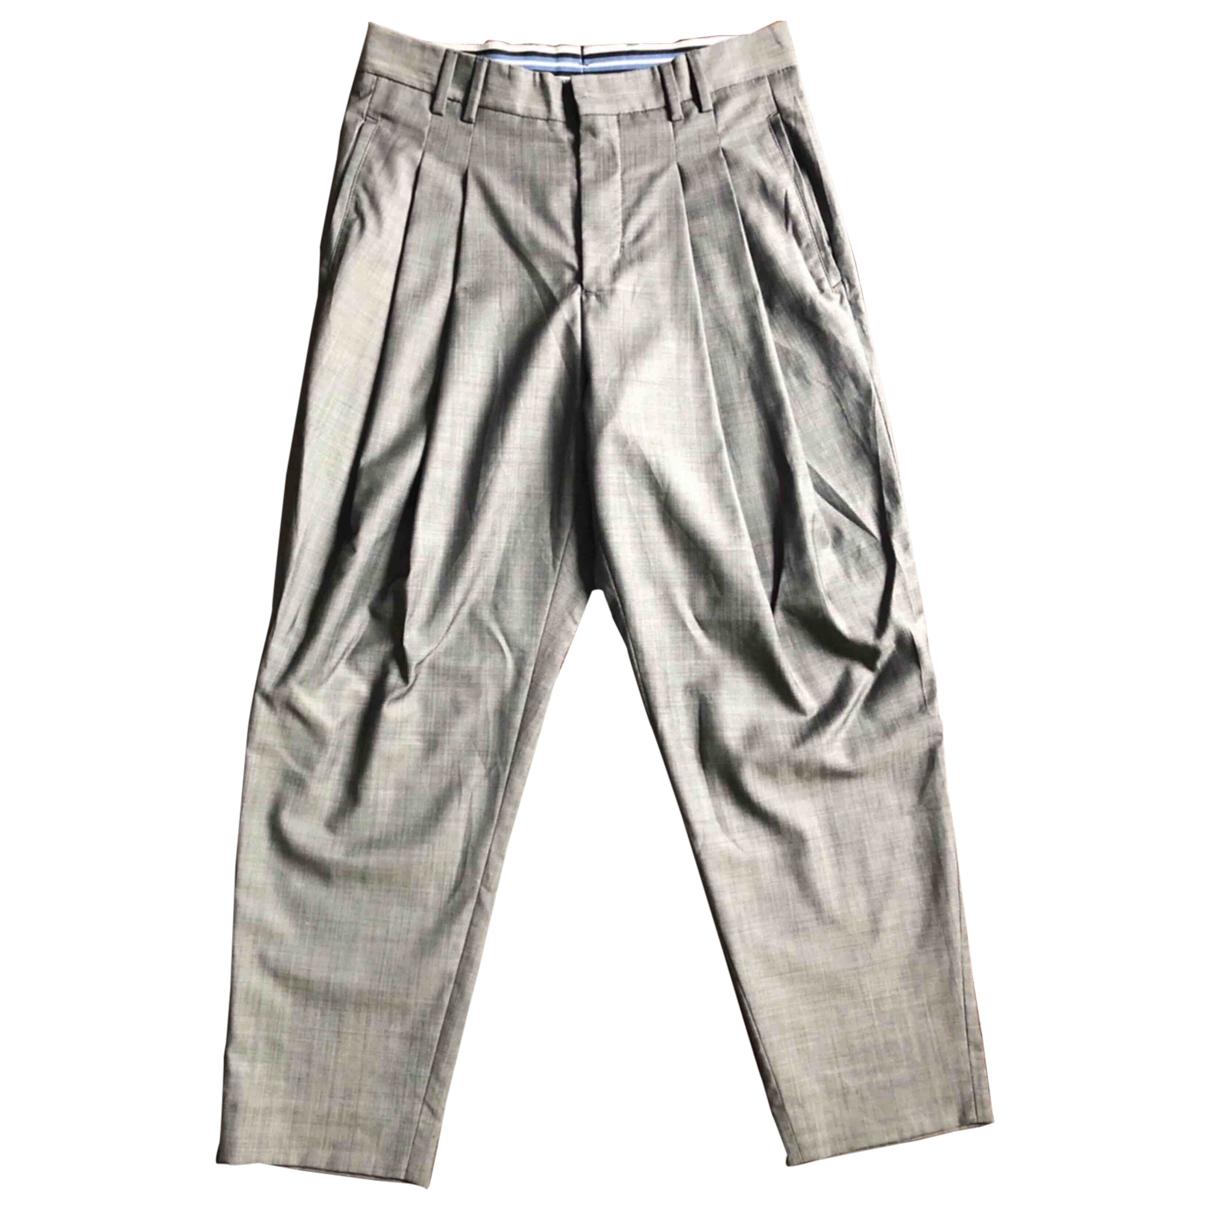 Zara \N Grey Cotton Trousers for Men 28 UK - US